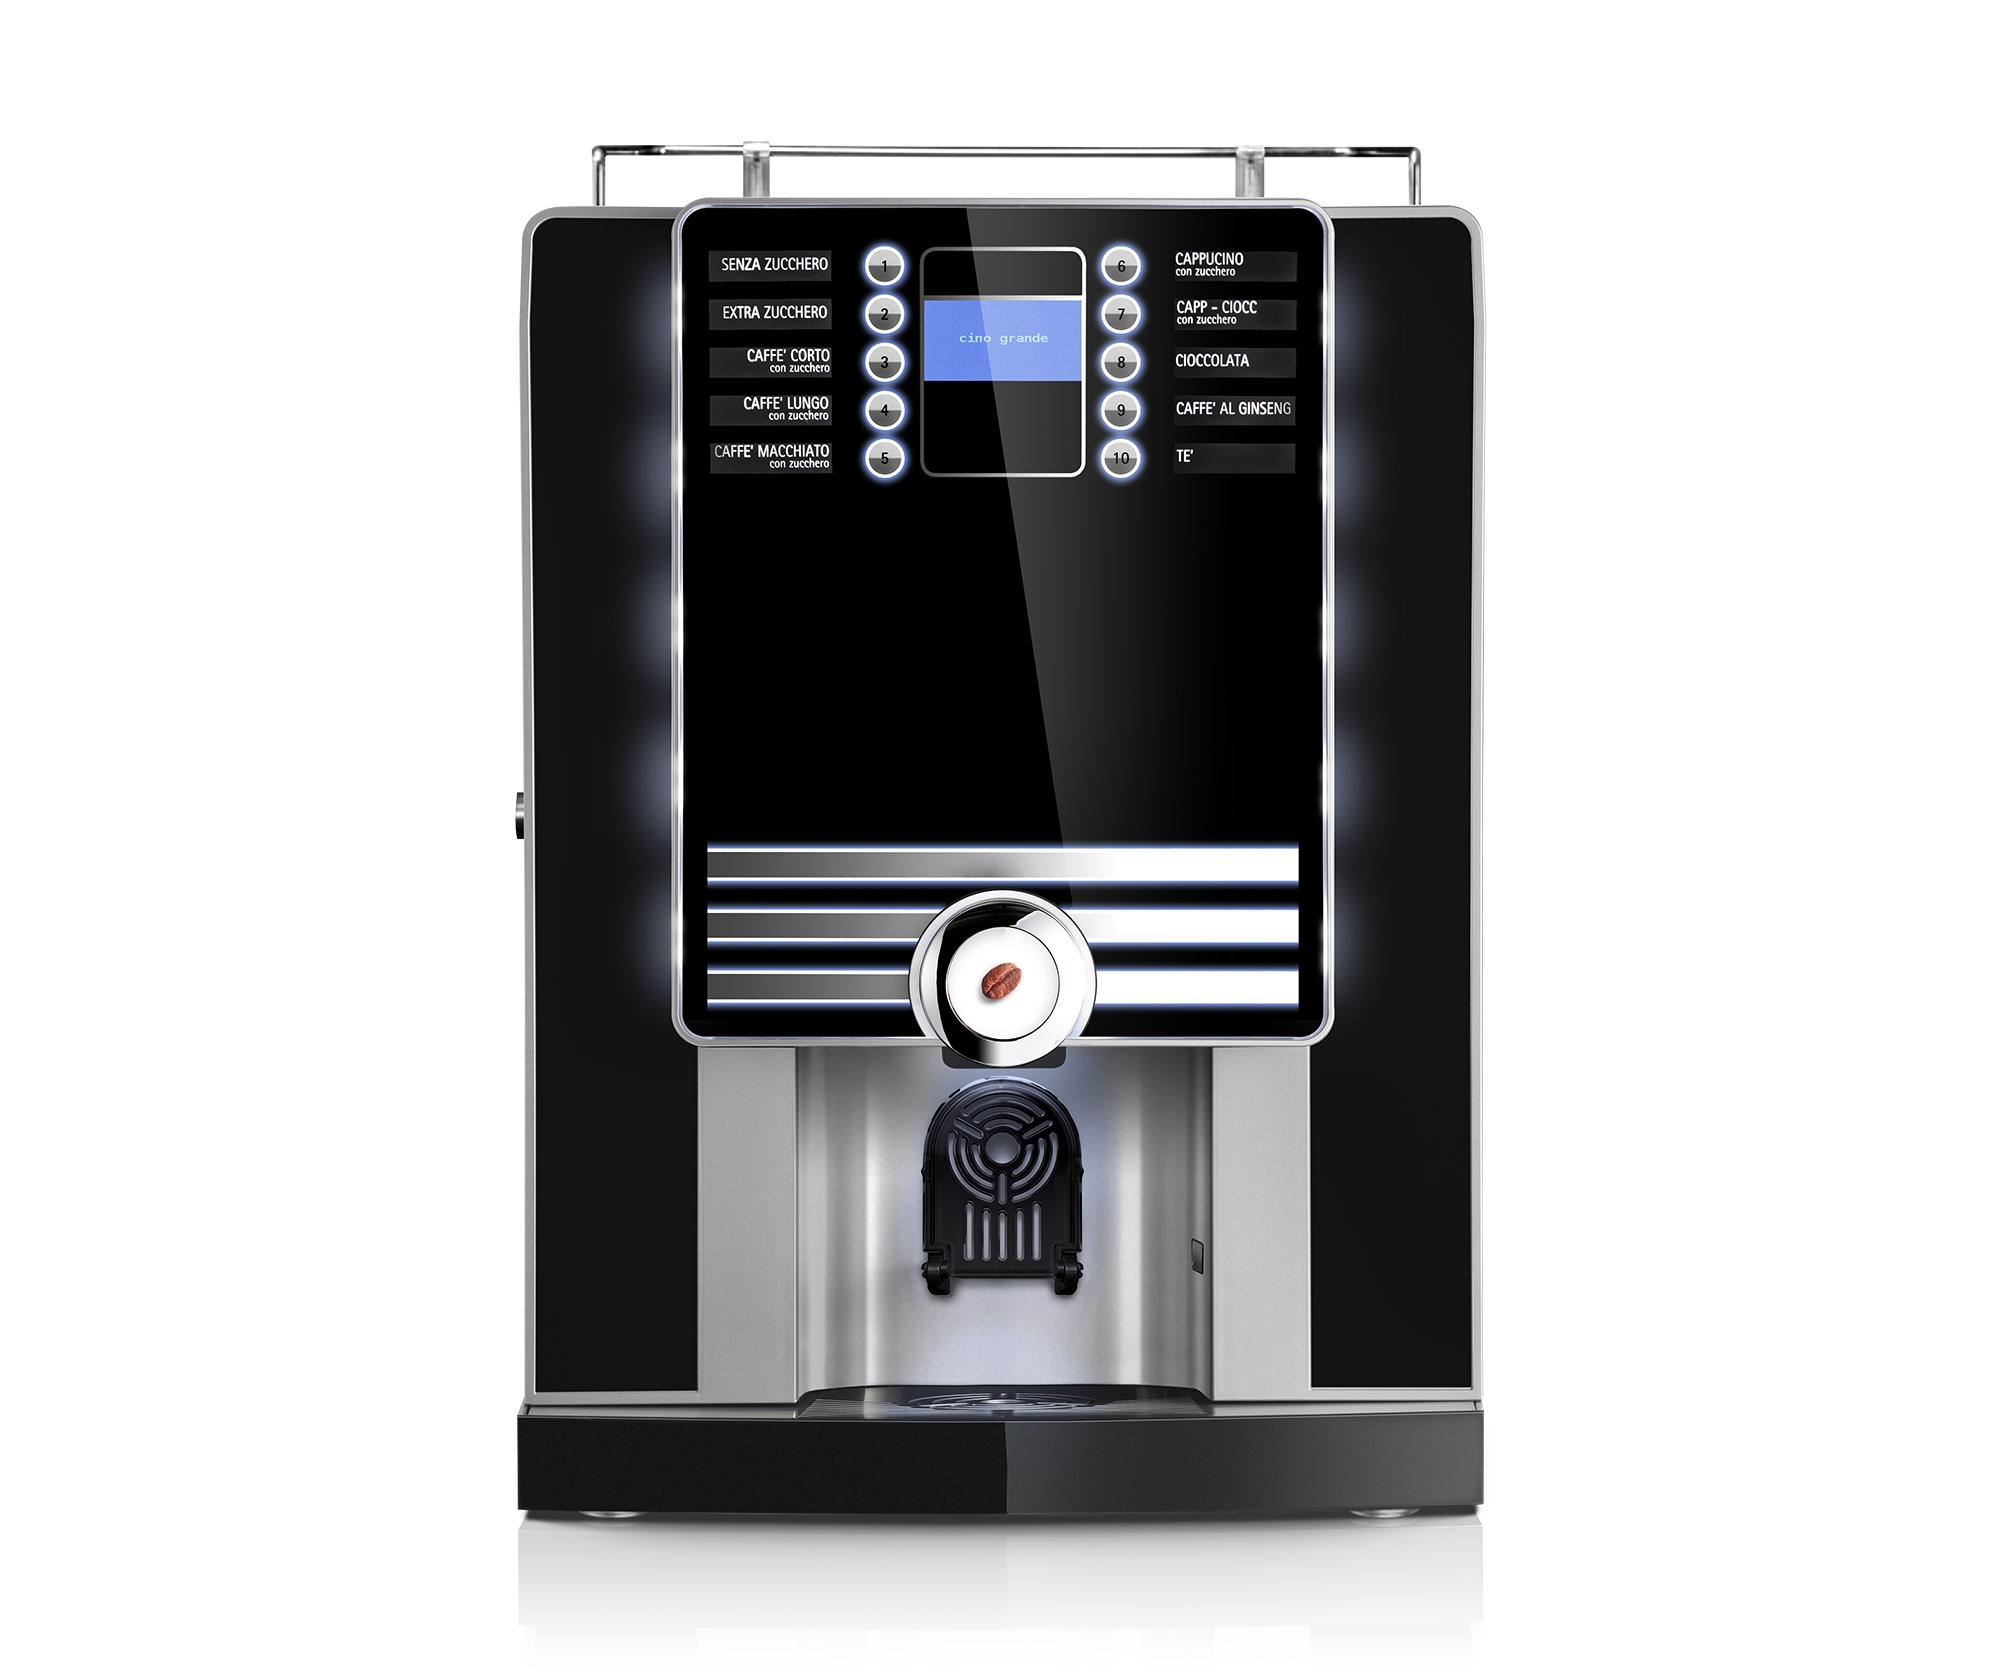 koffiemachine rheavendors xs grande pro koffie holland. Black Bedroom Furniture Sets. Home Design Ideas